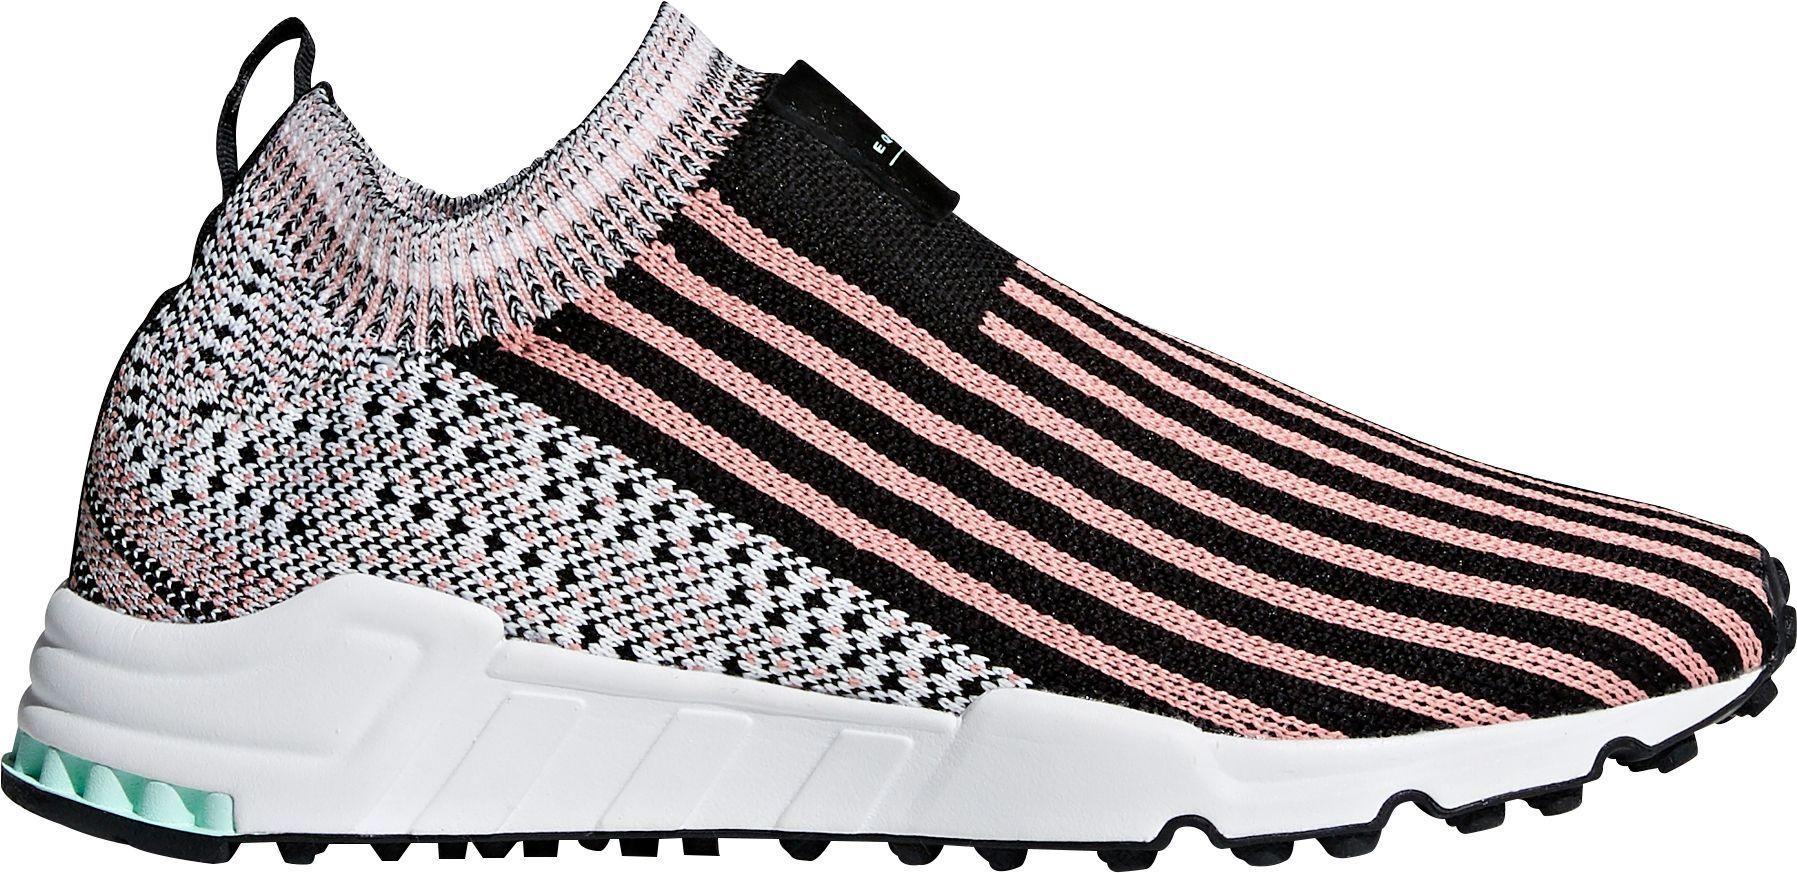 newest collection 15af5 44958 adidas Originals Womens EQT Support Sock Primeknit Shoes, Size 7.5, Black